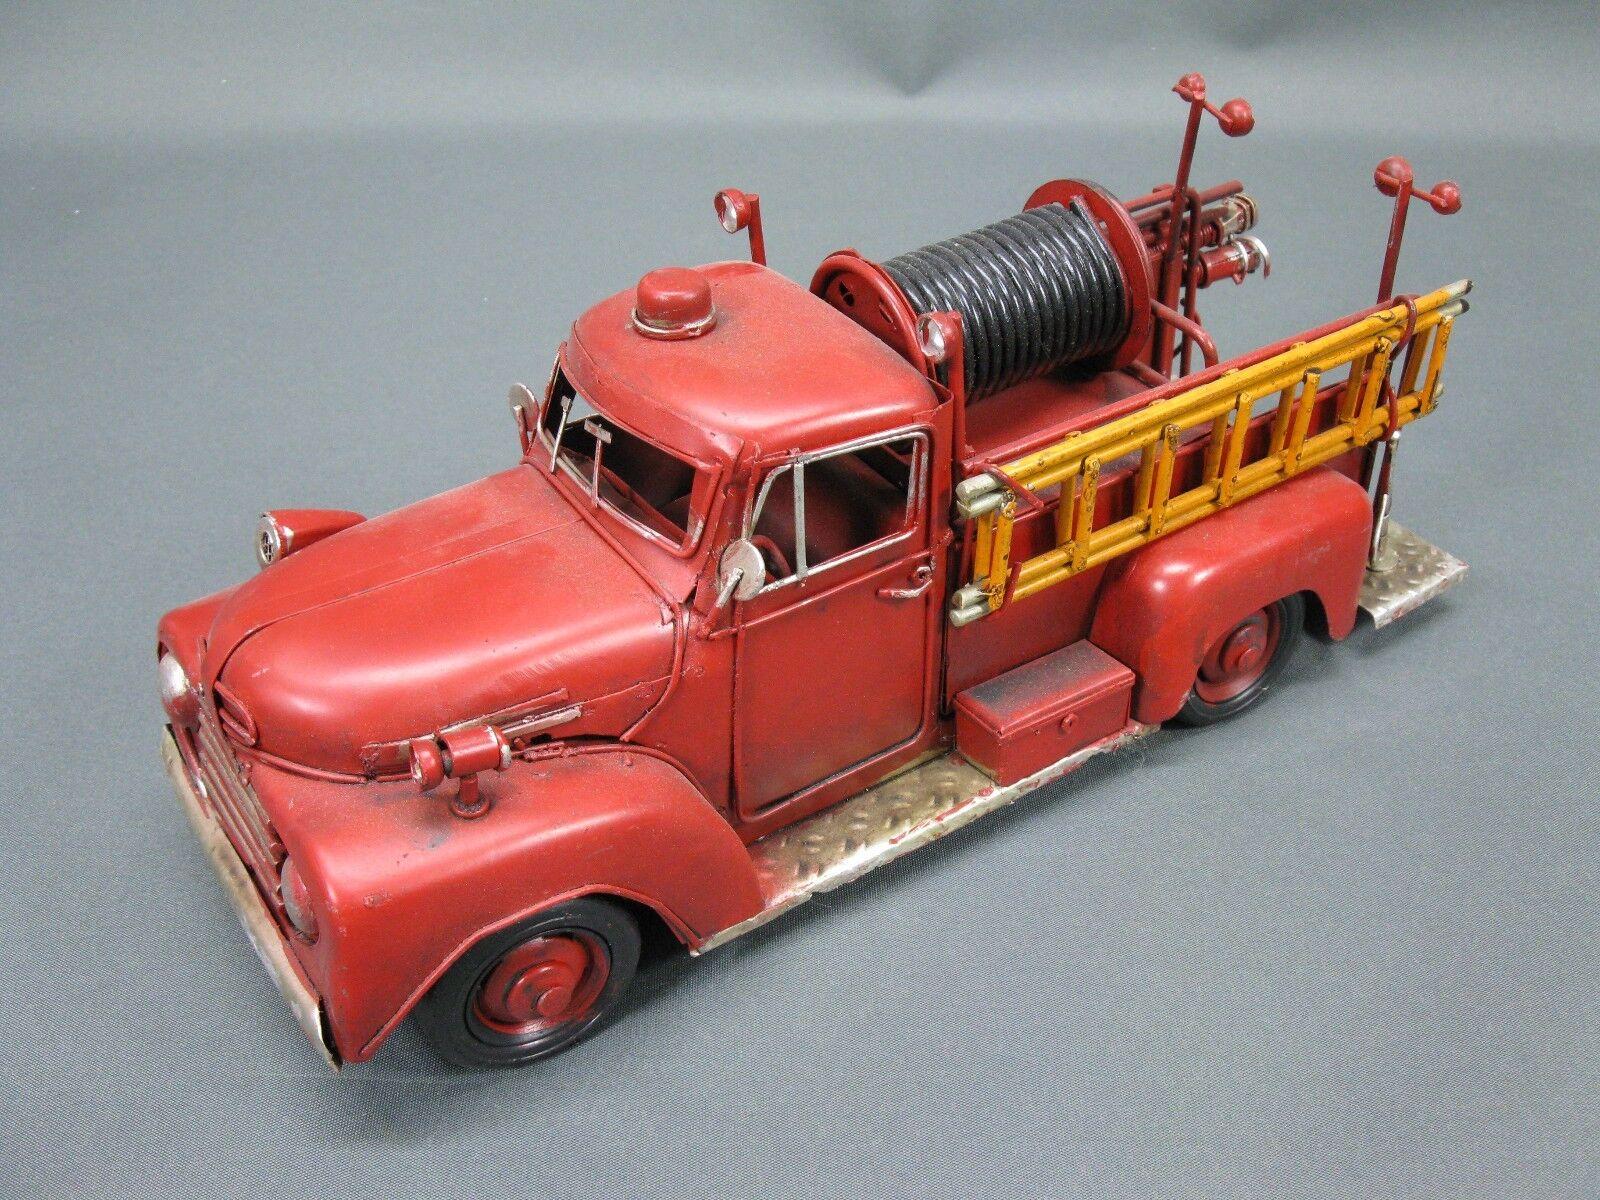 Vieja bomberos maqueta de coche auto de de de chapa 30 cm bomberos Oldtimer auto us Car ee89d3